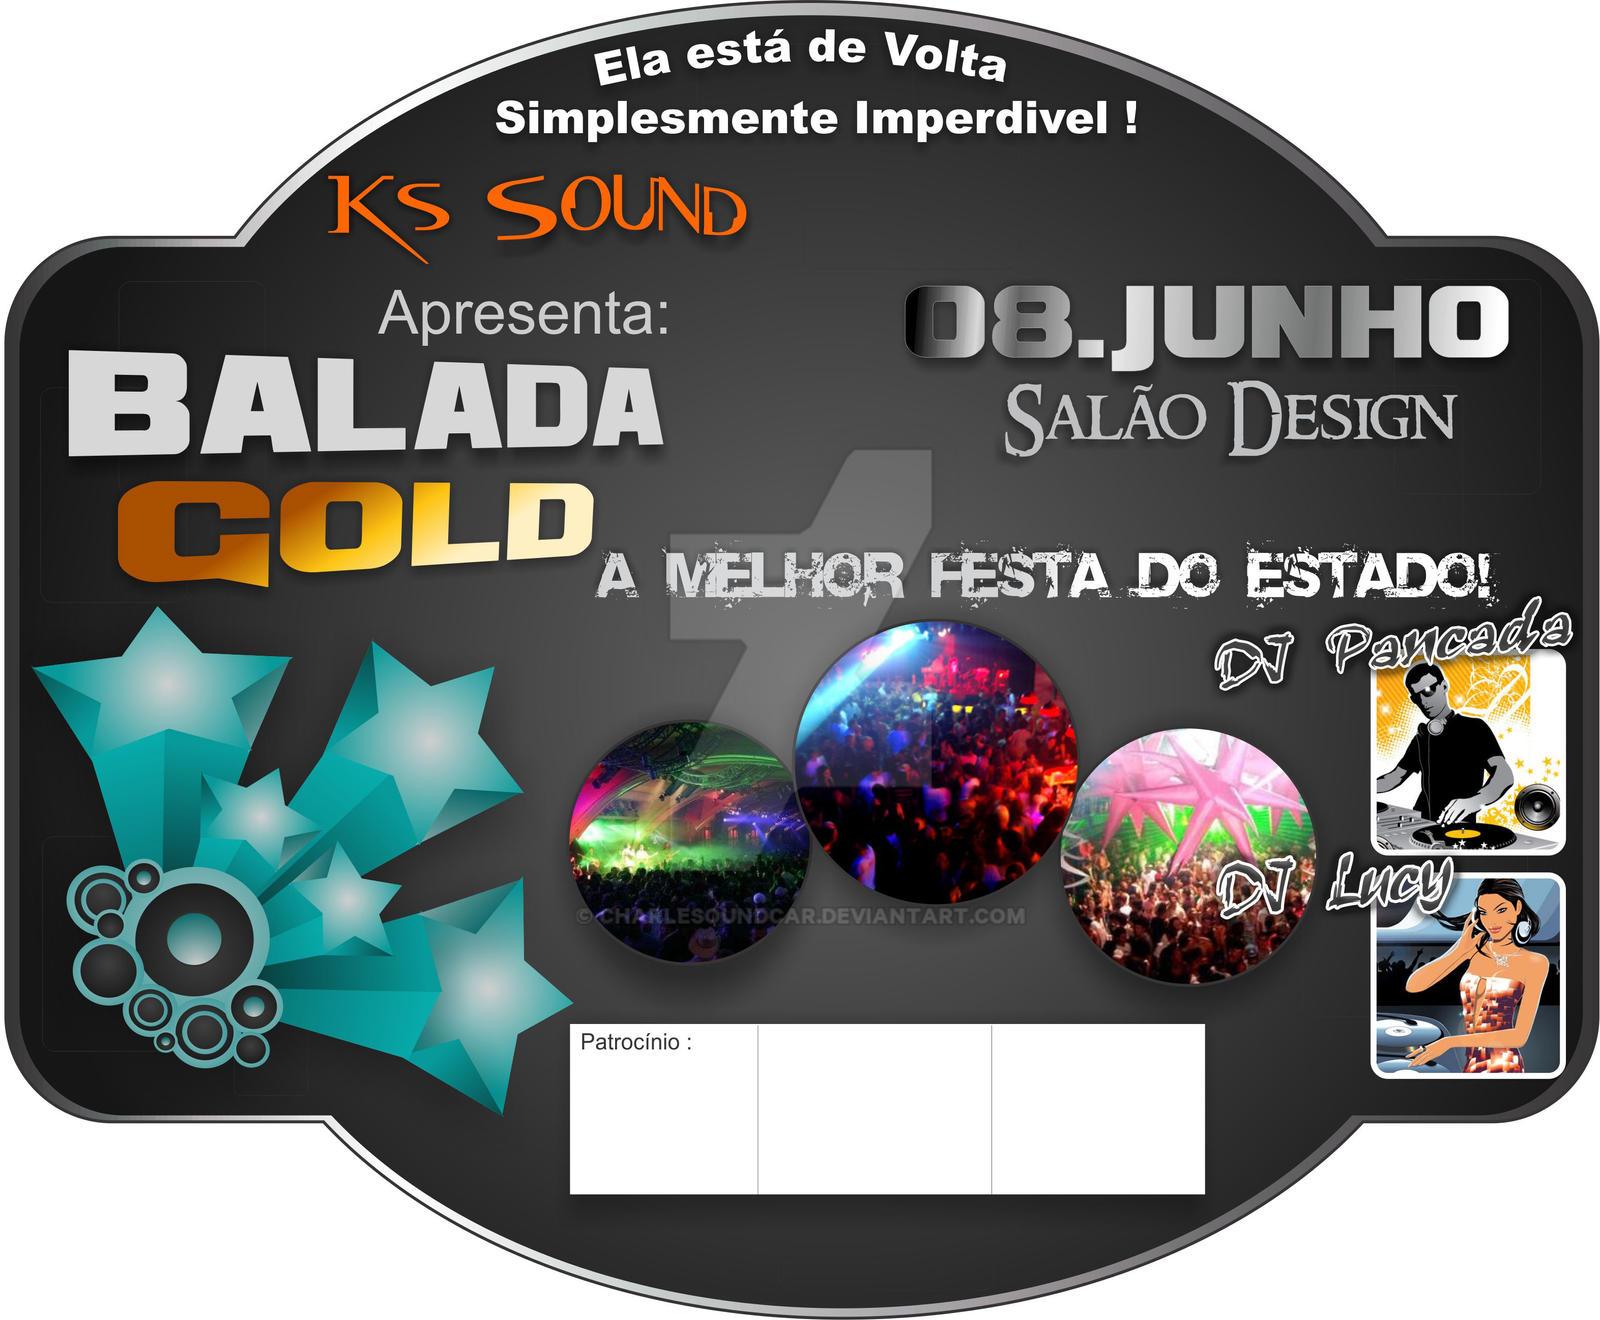 flyer Balada Gold by CHARLESOUNDcar